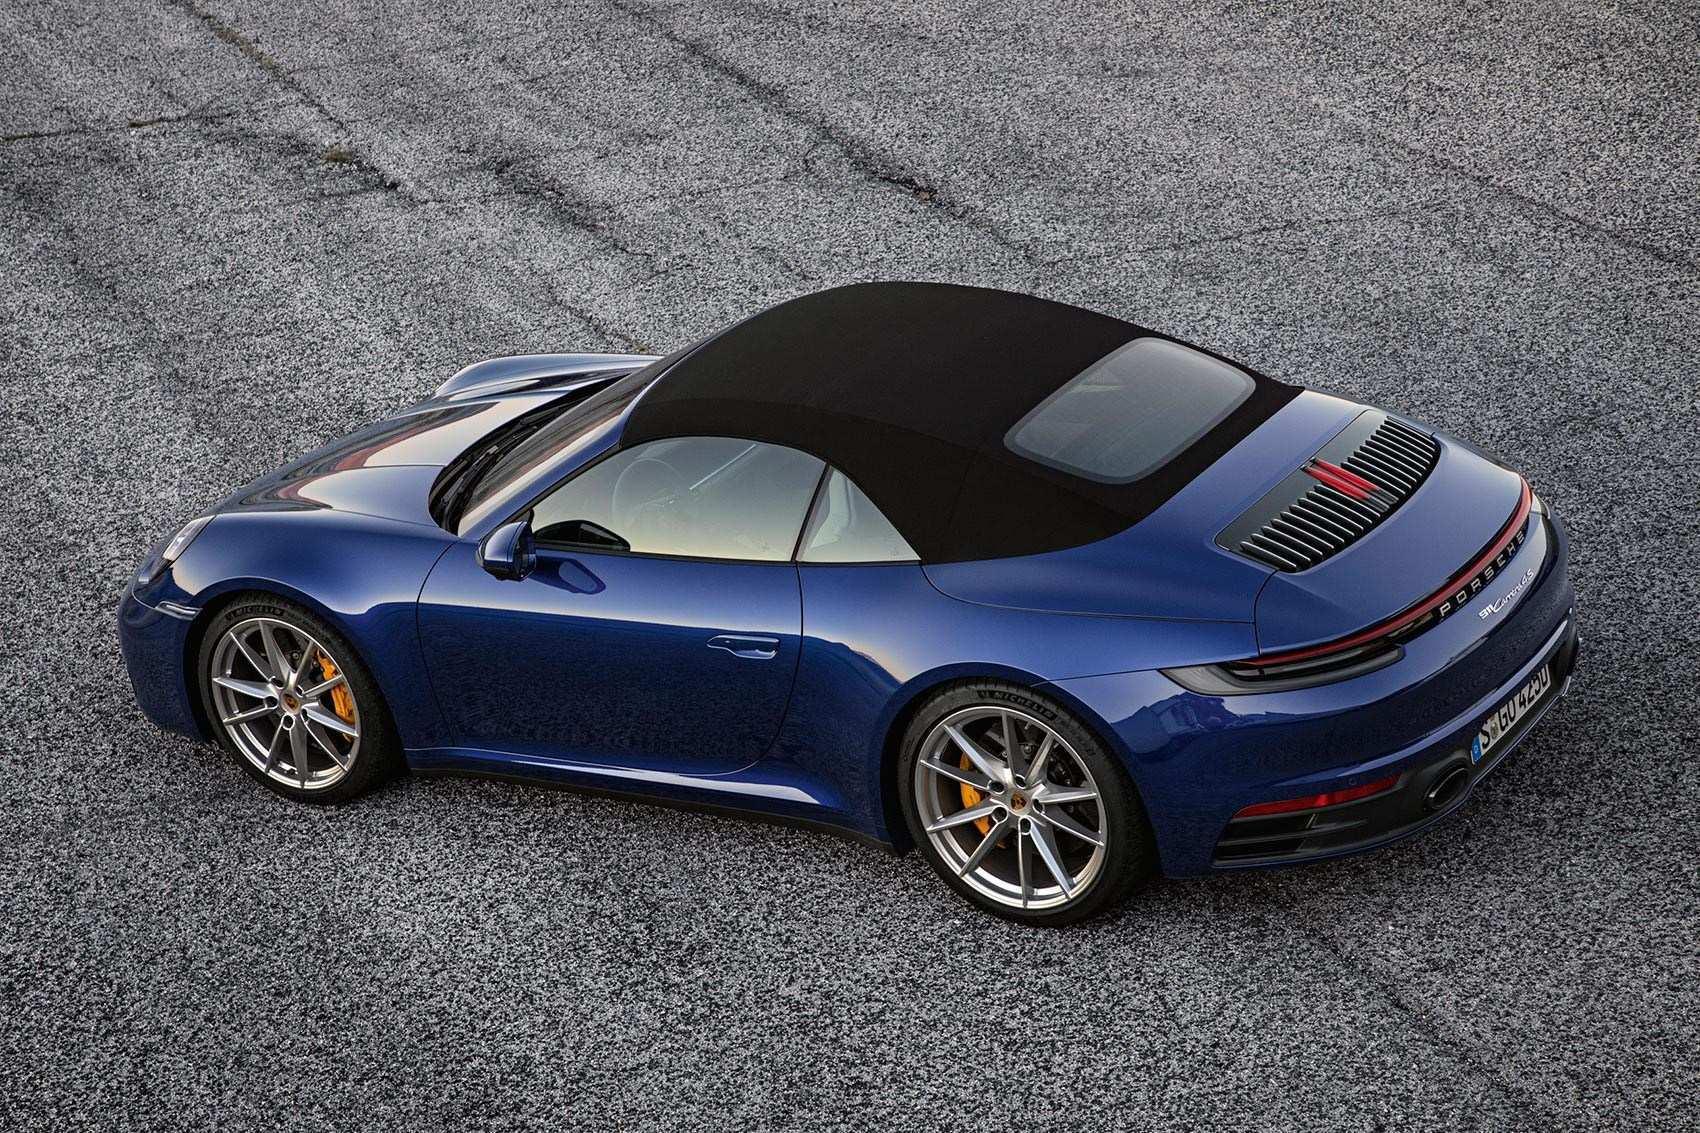 85 New 2019 Porsche Release Specs for 2019 Porsche Release